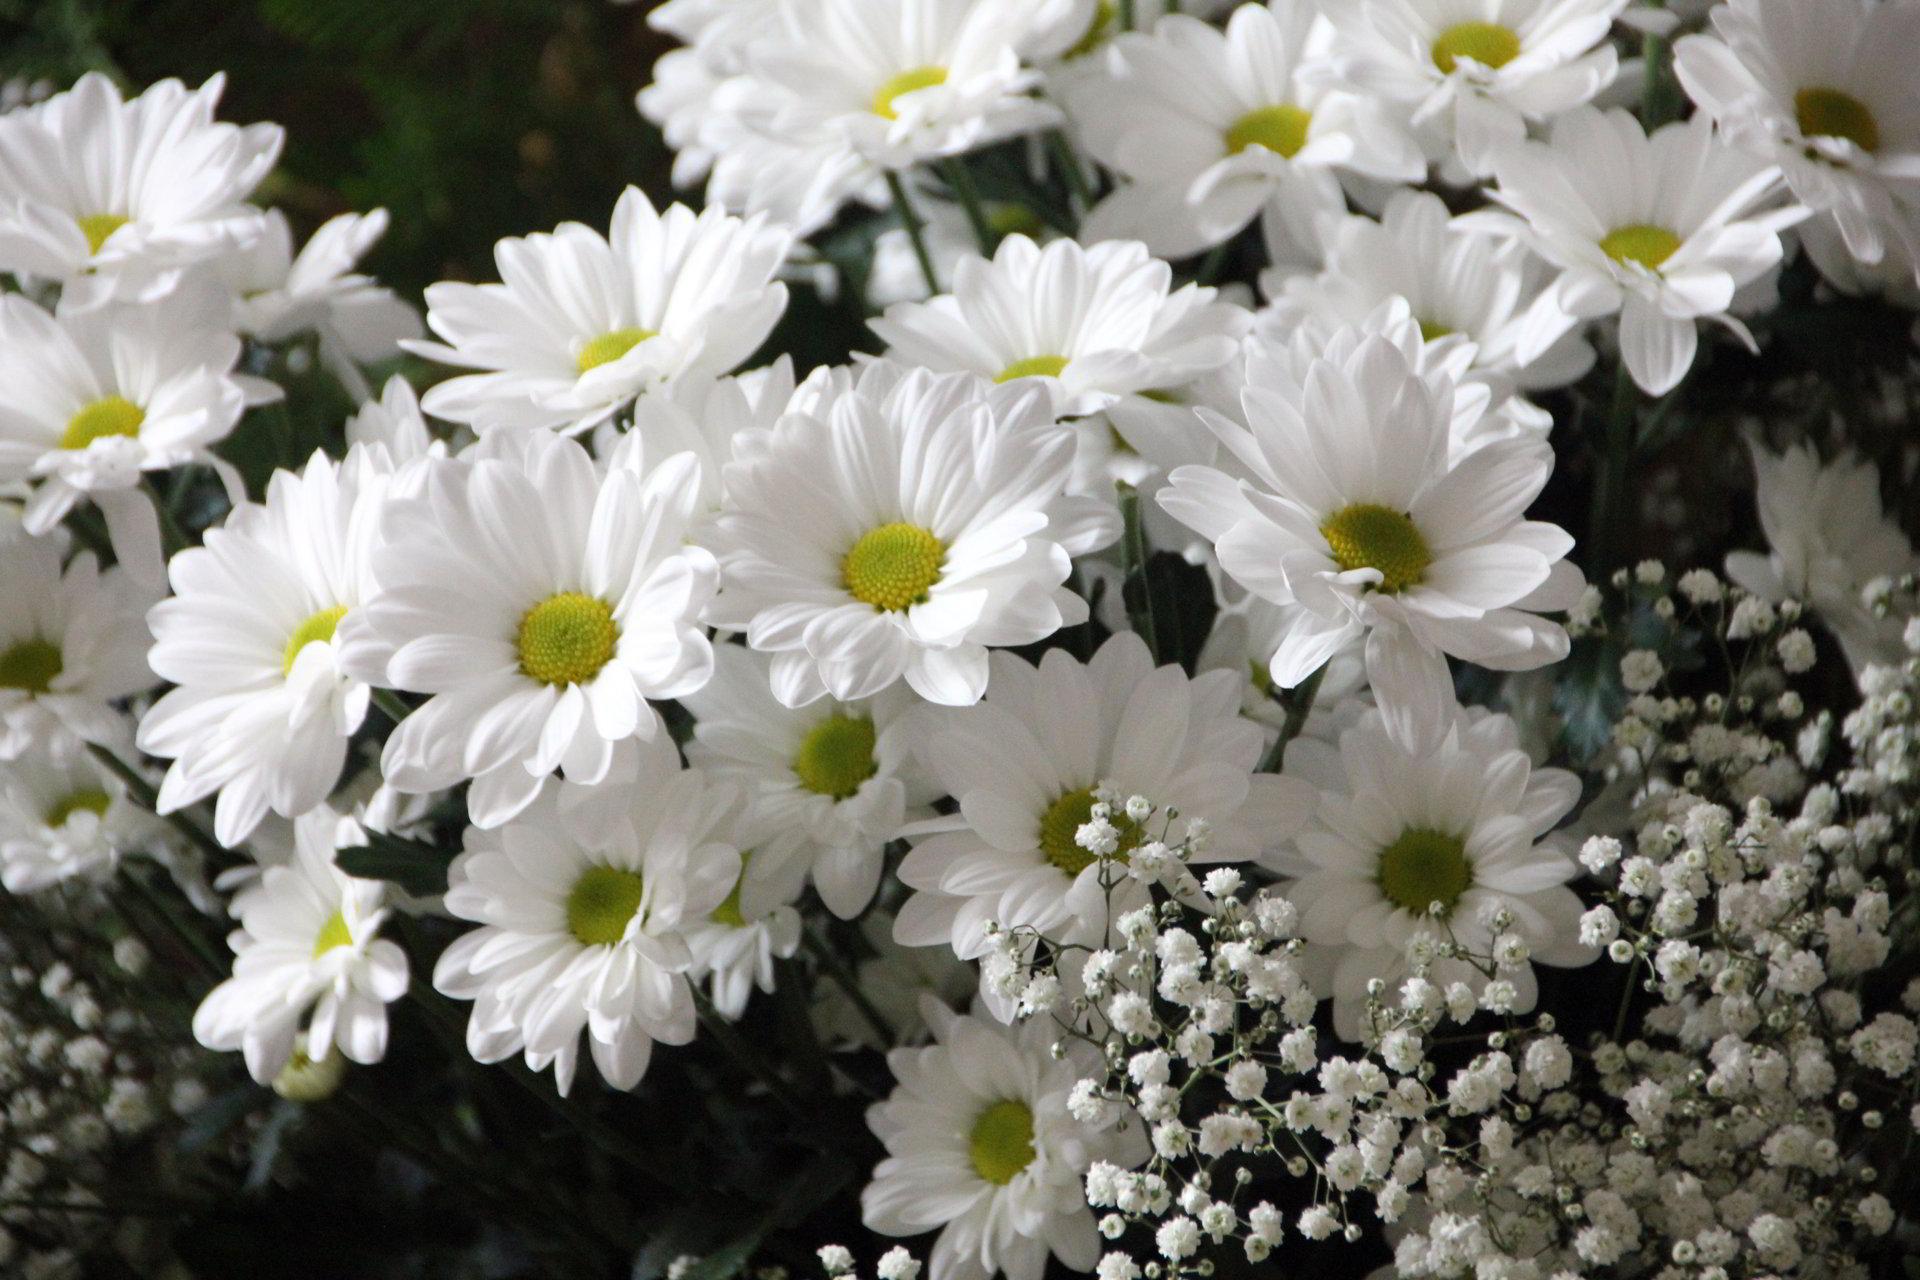 hinh anh hoa cuc dep 64